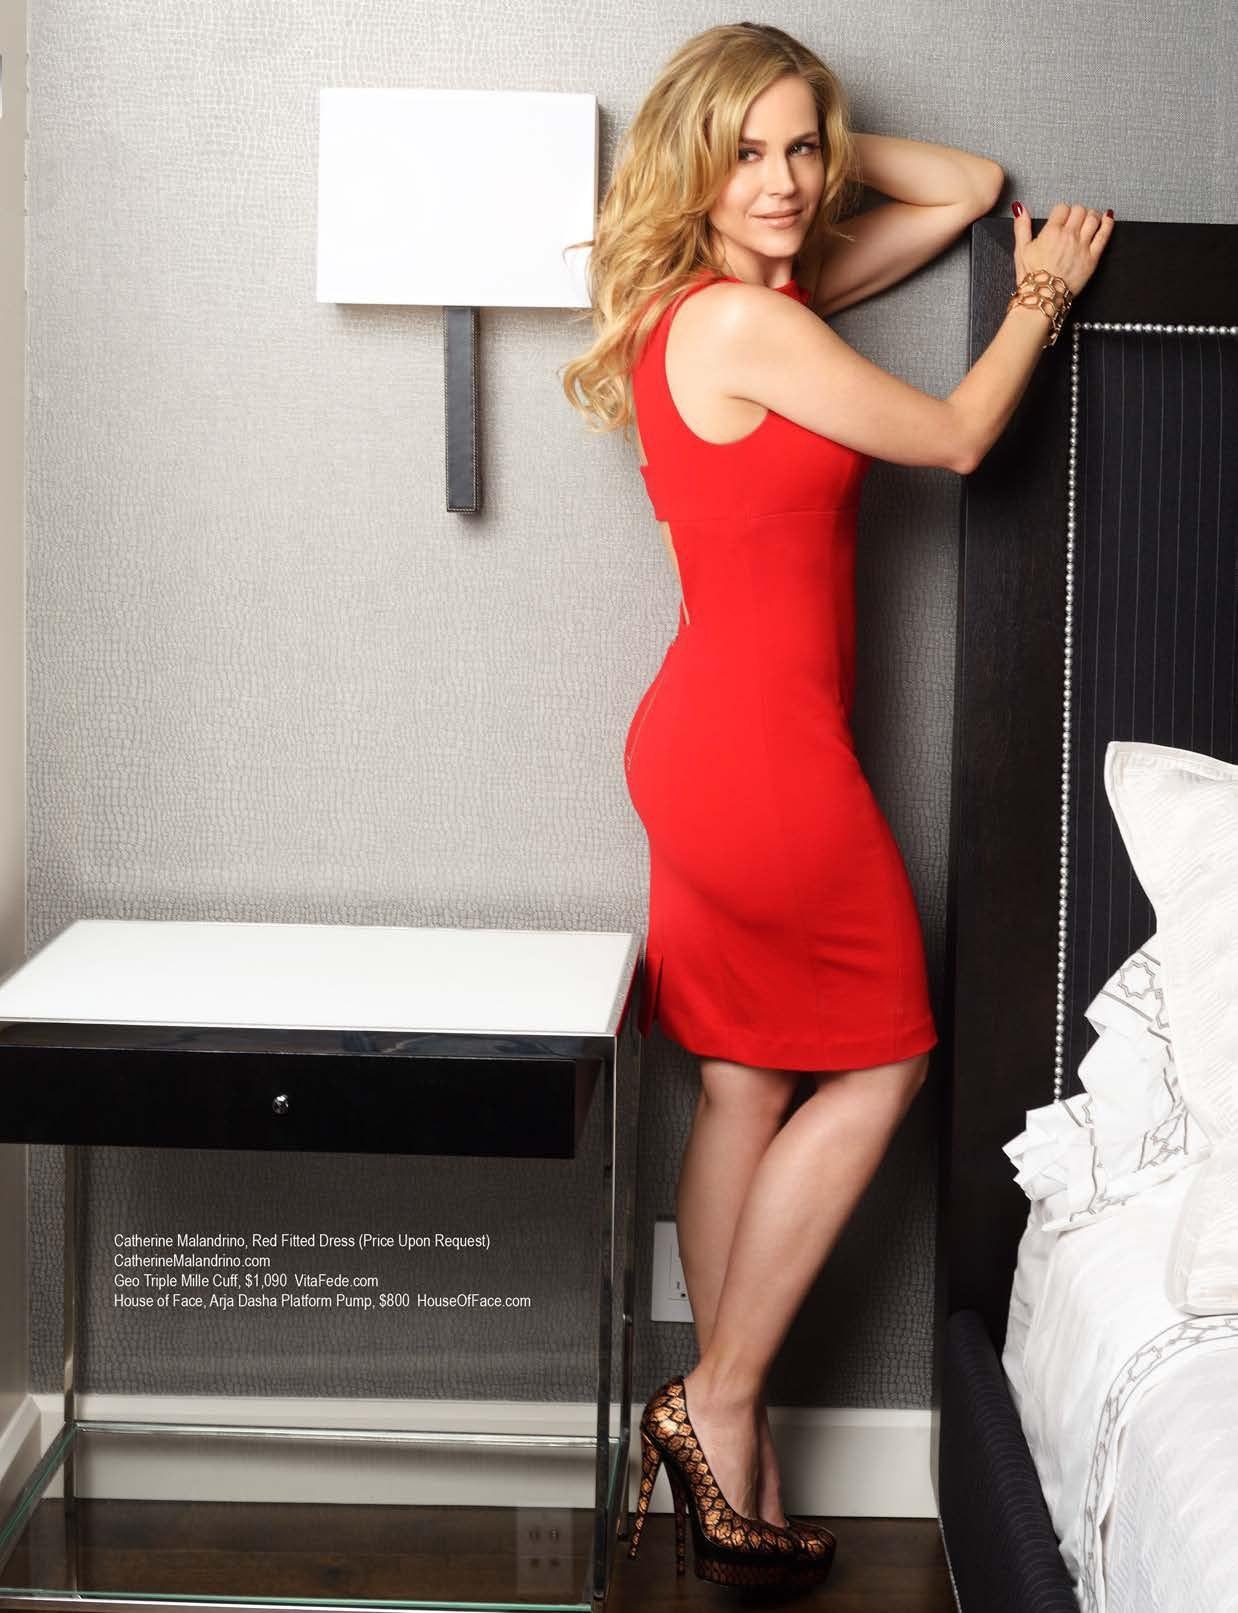 Julie Benz Wallpapers hd